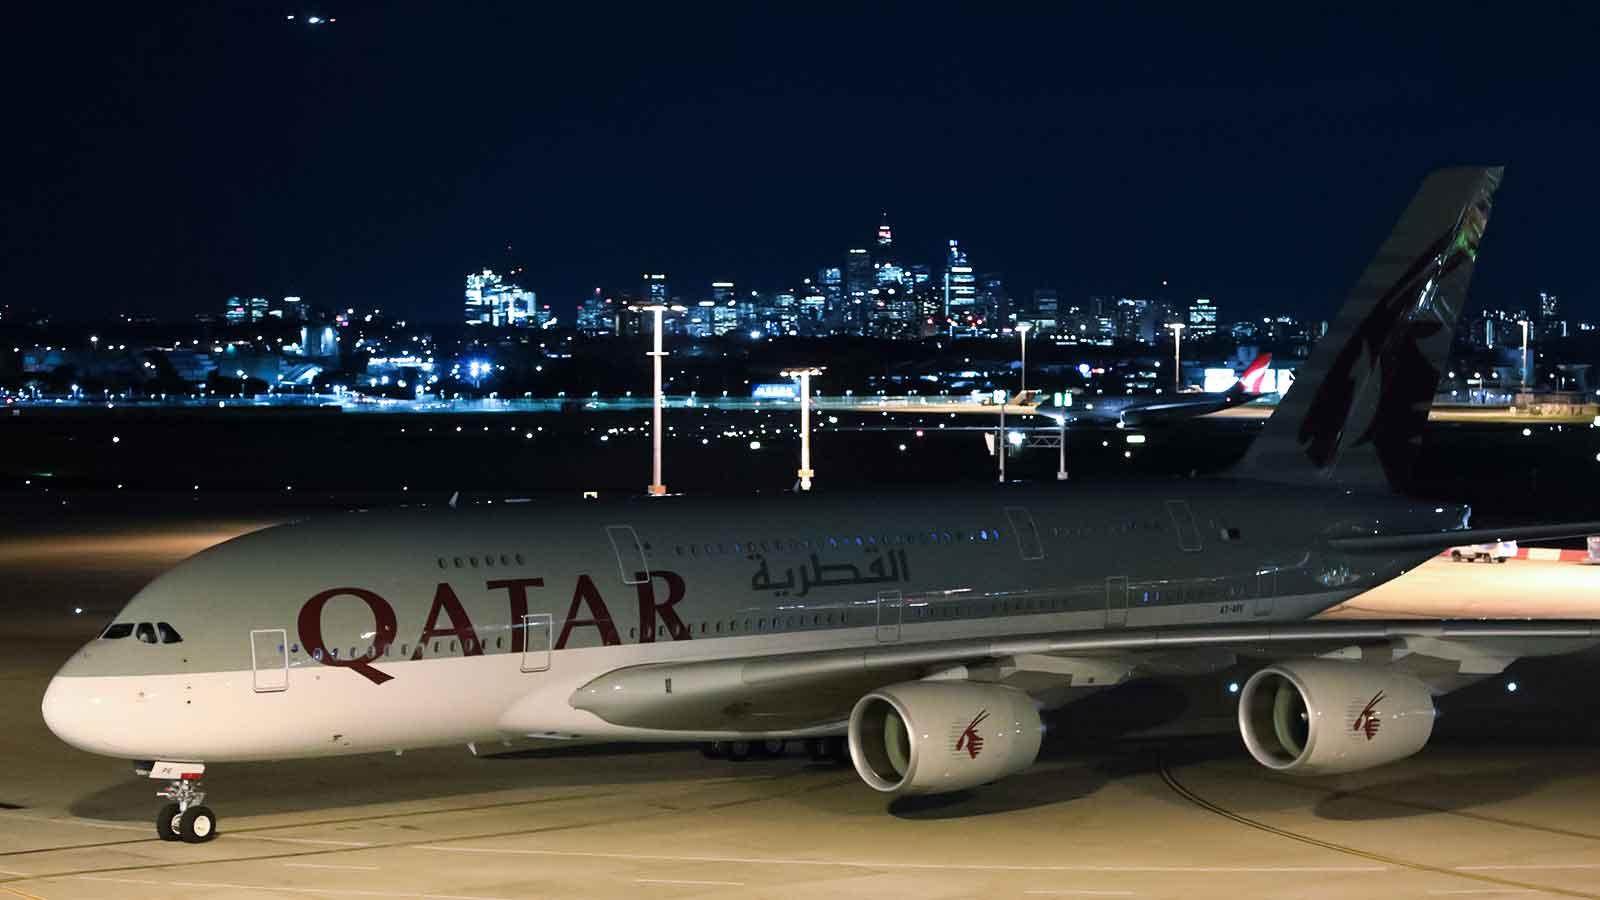 Qatar Airways A380 at Sydney Airport